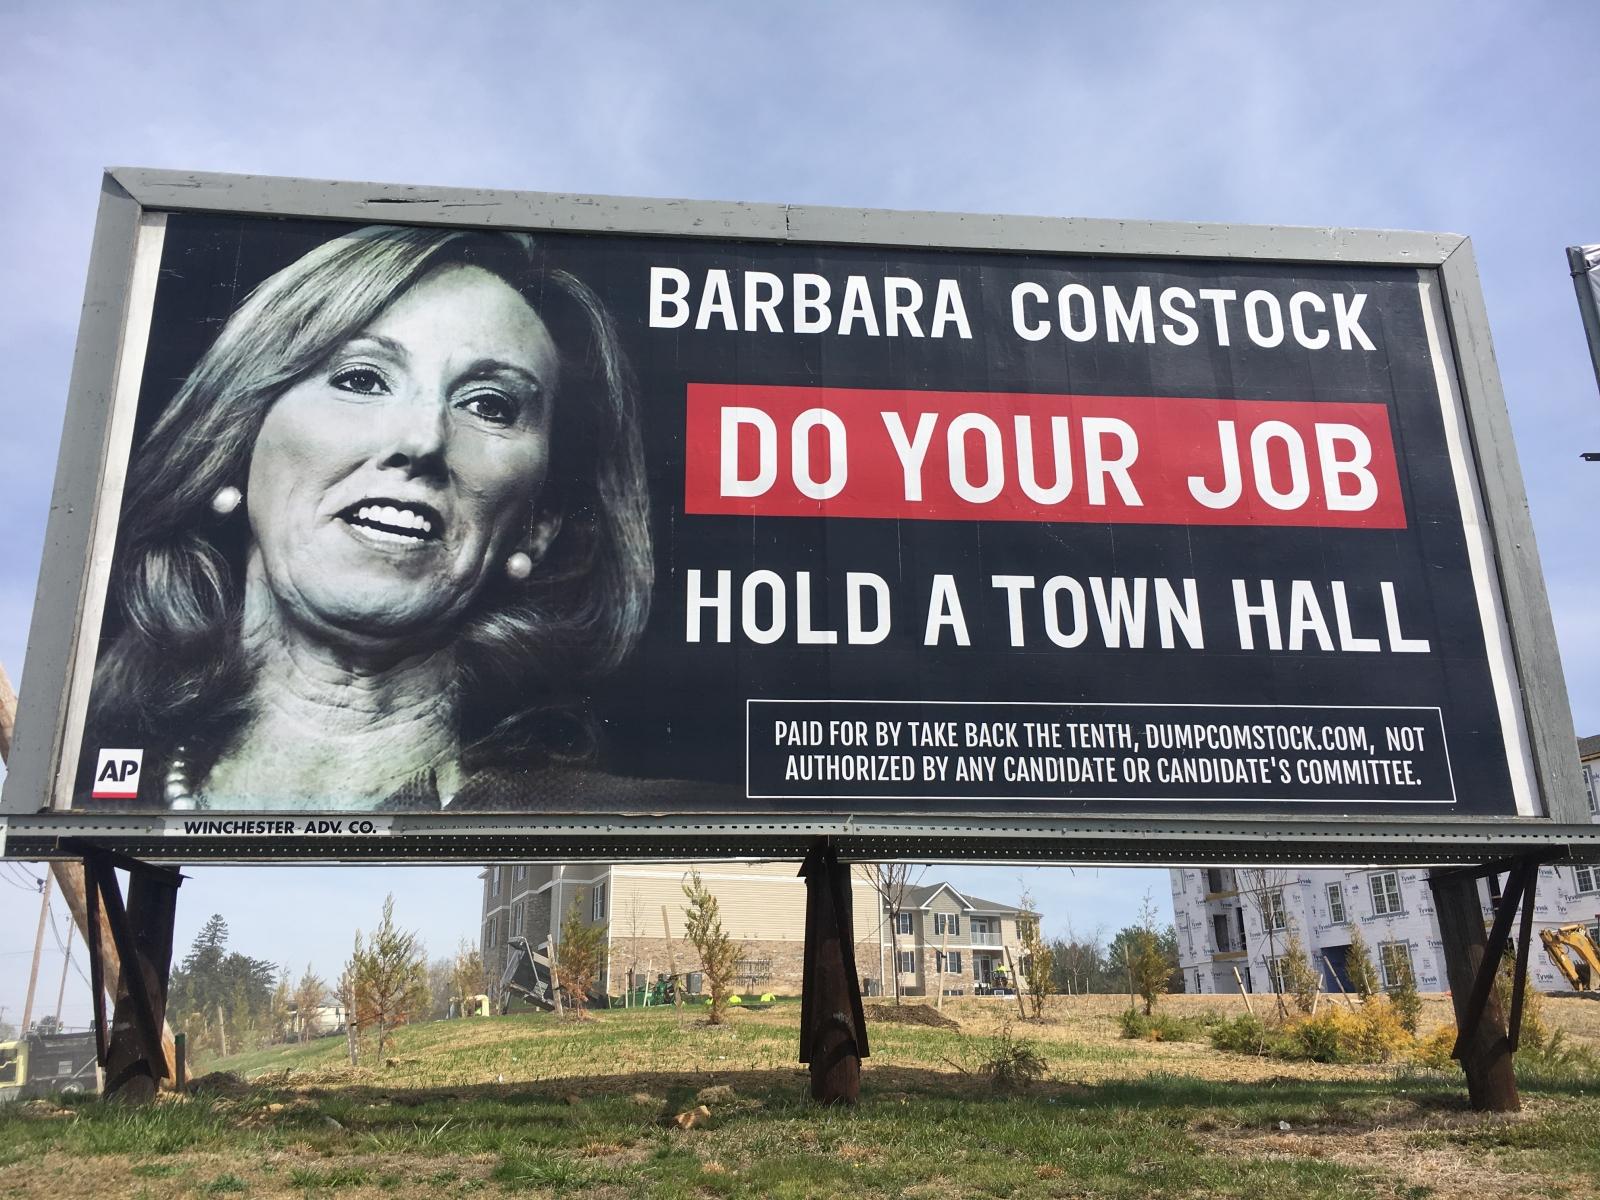 'Do your job' billboard